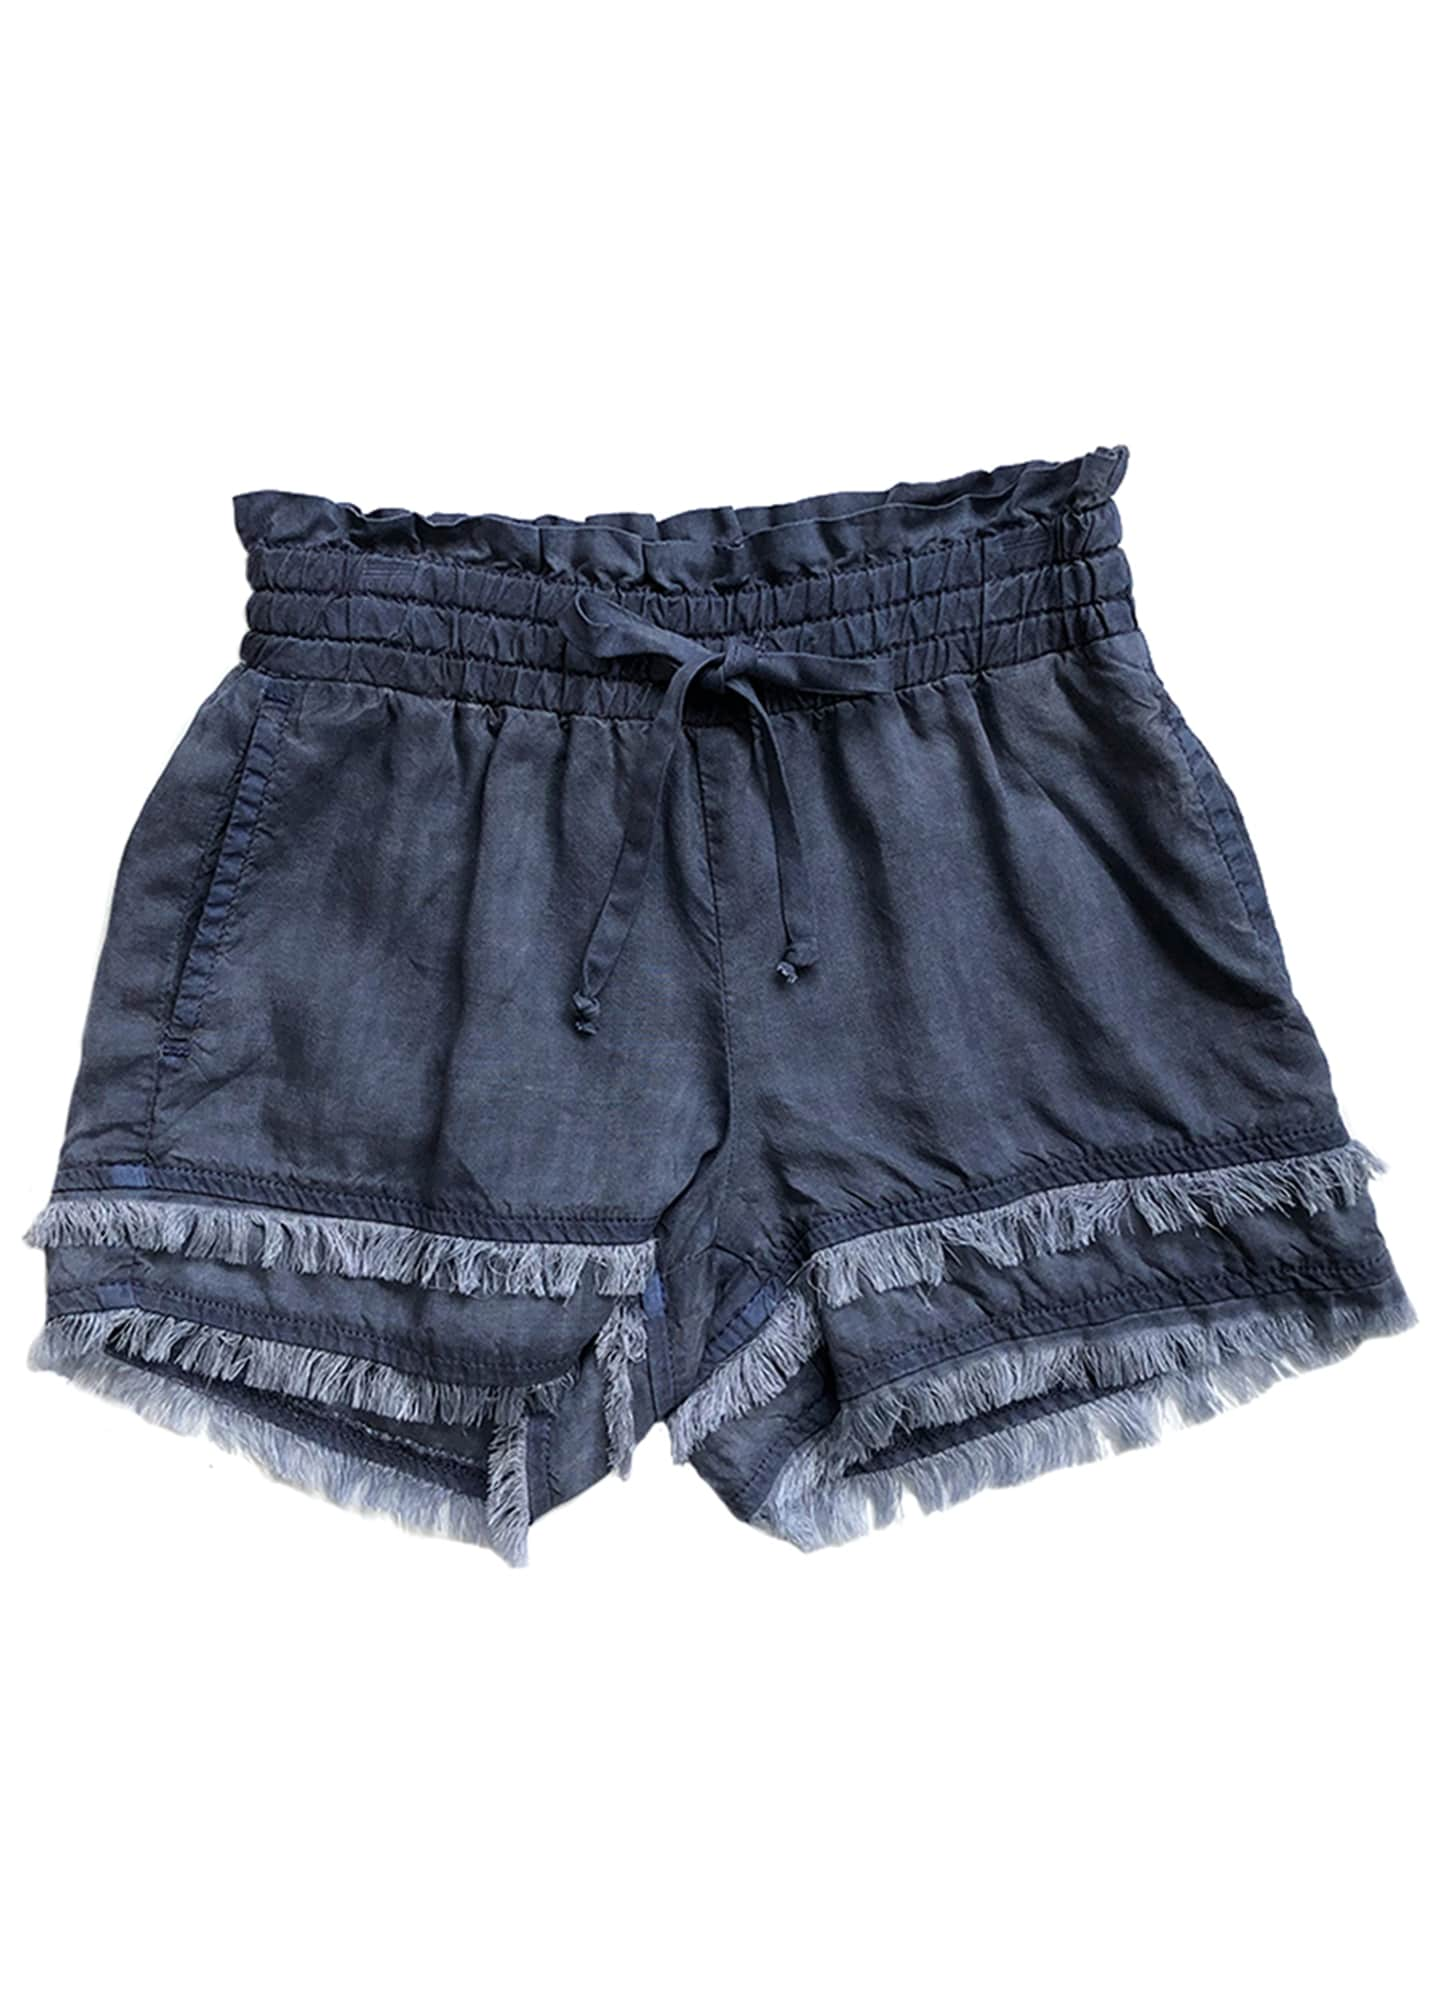 Bella Dahl Fray Hem Flowy Shorts, Size 8-14